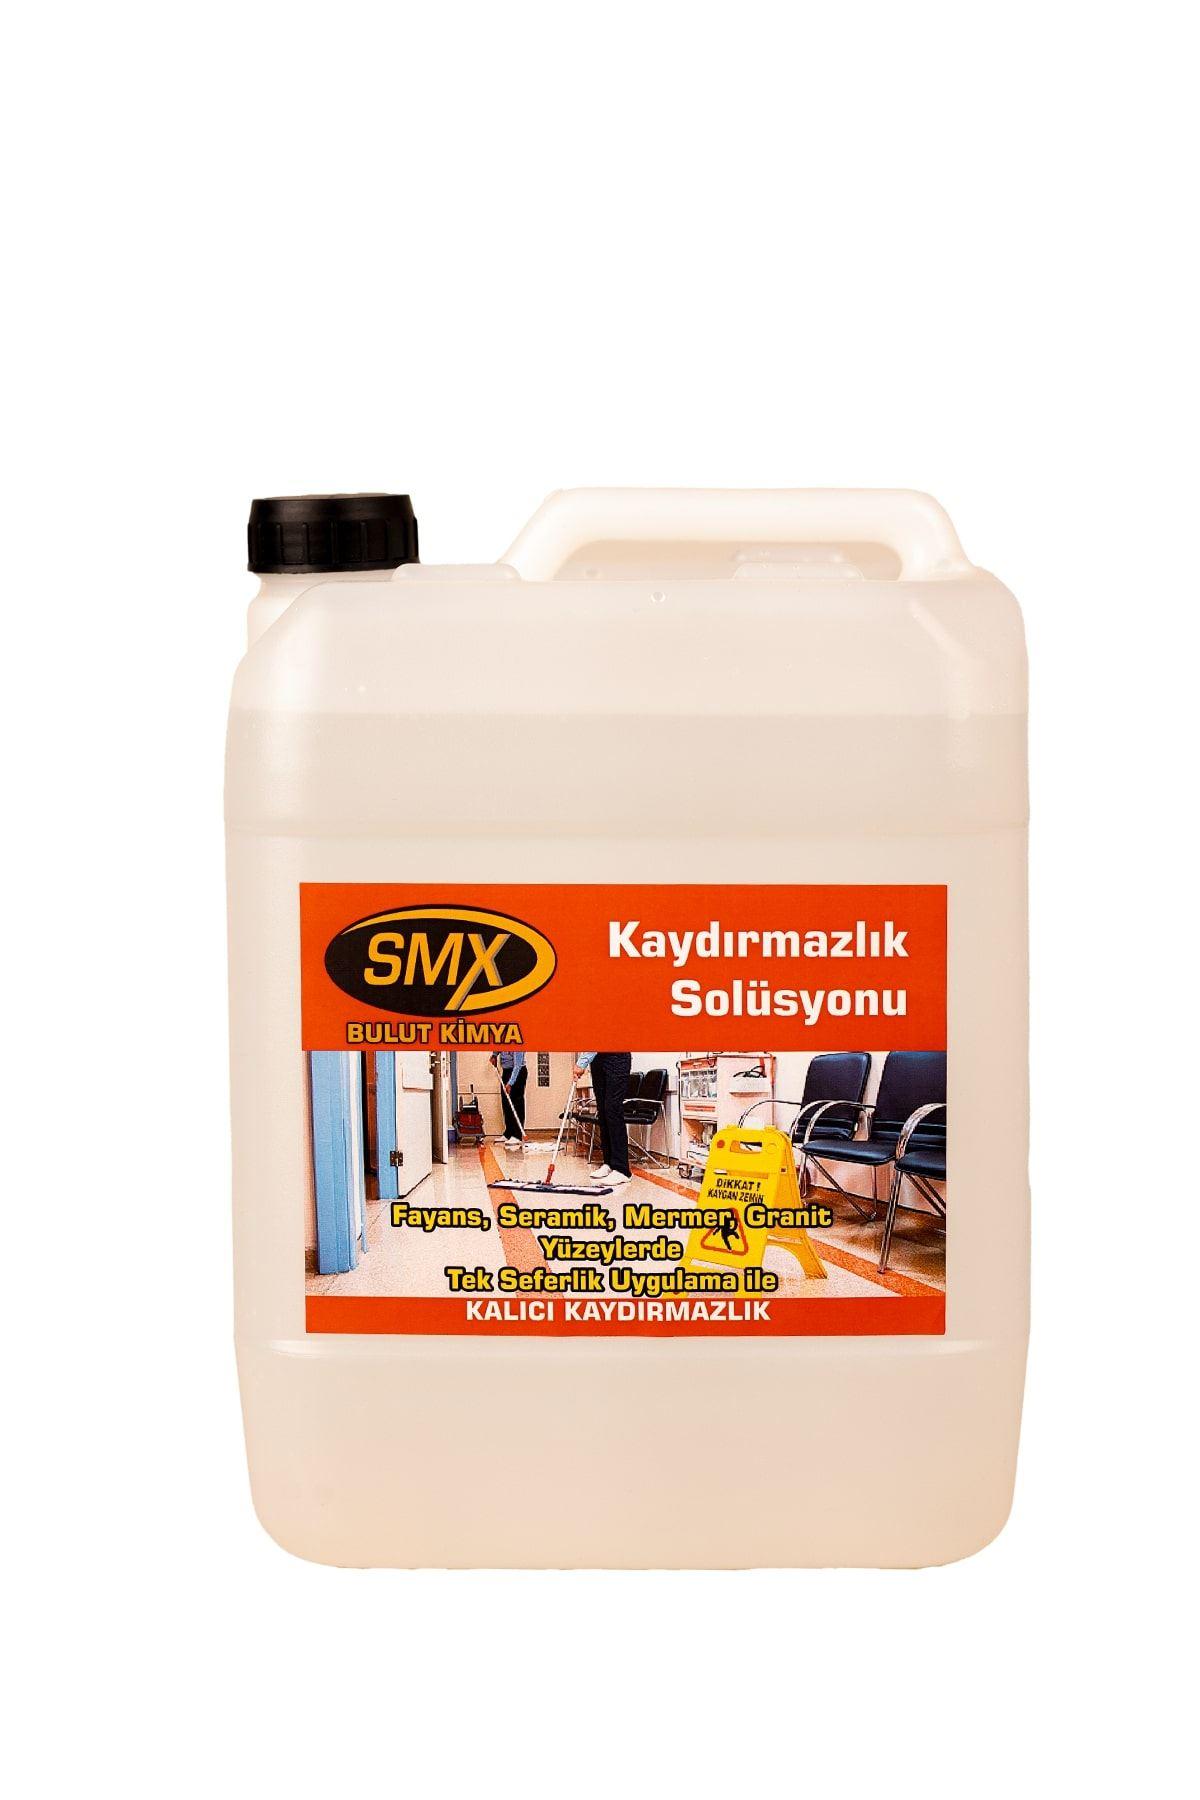 SMX KAYDIRMAZLIK SOLÜSYONU (5 LT)